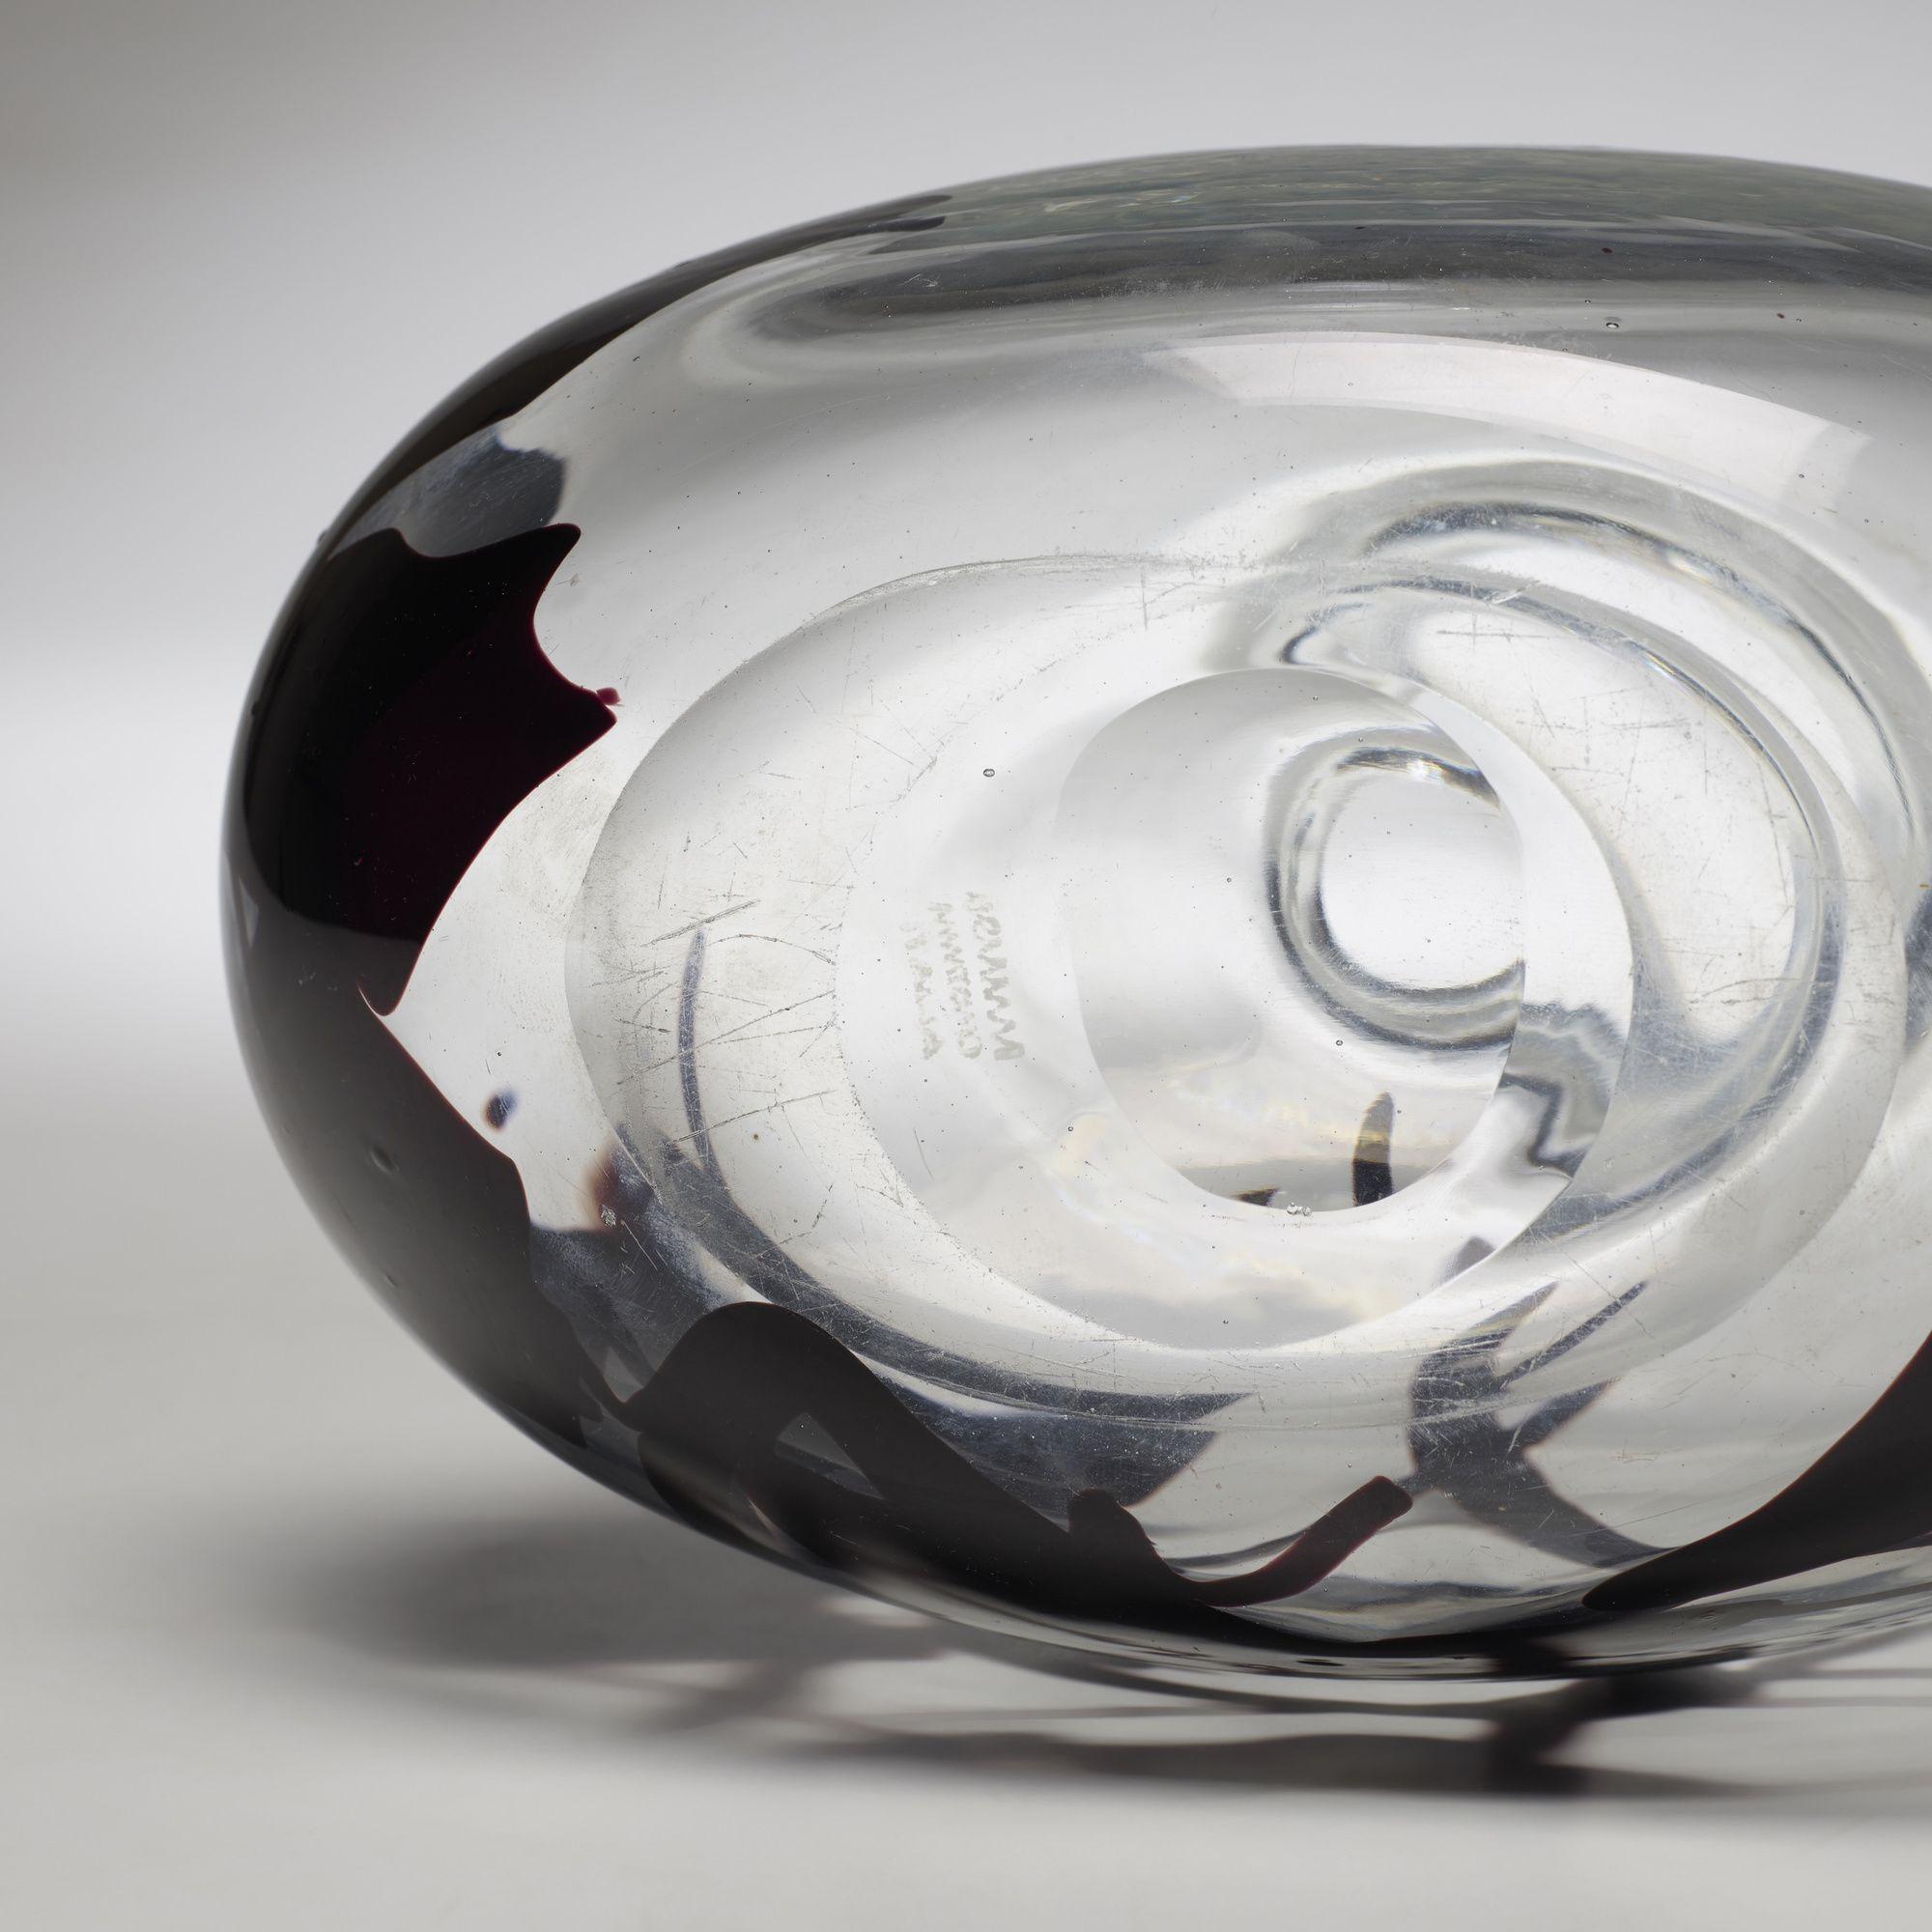 venetian glass bowls vases of venetian glass vase inspirational 139 fulvio bianconi important con inside venetian glass vase inspirational 139 fulvio bianconi important con macchie vase model 4324